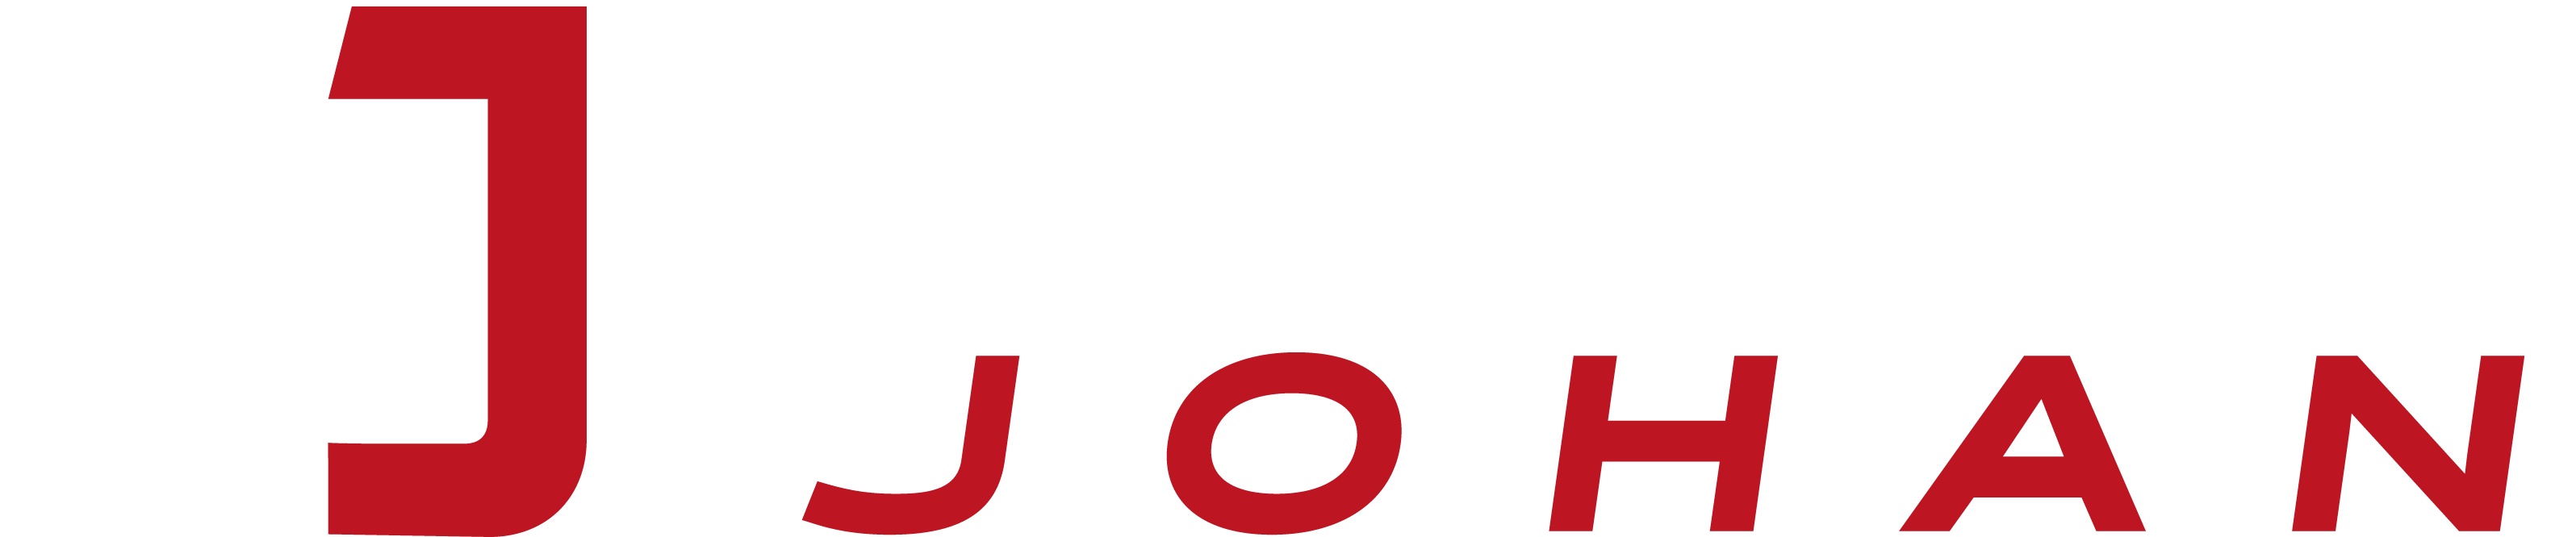 AUTOJOHAN logo světlé